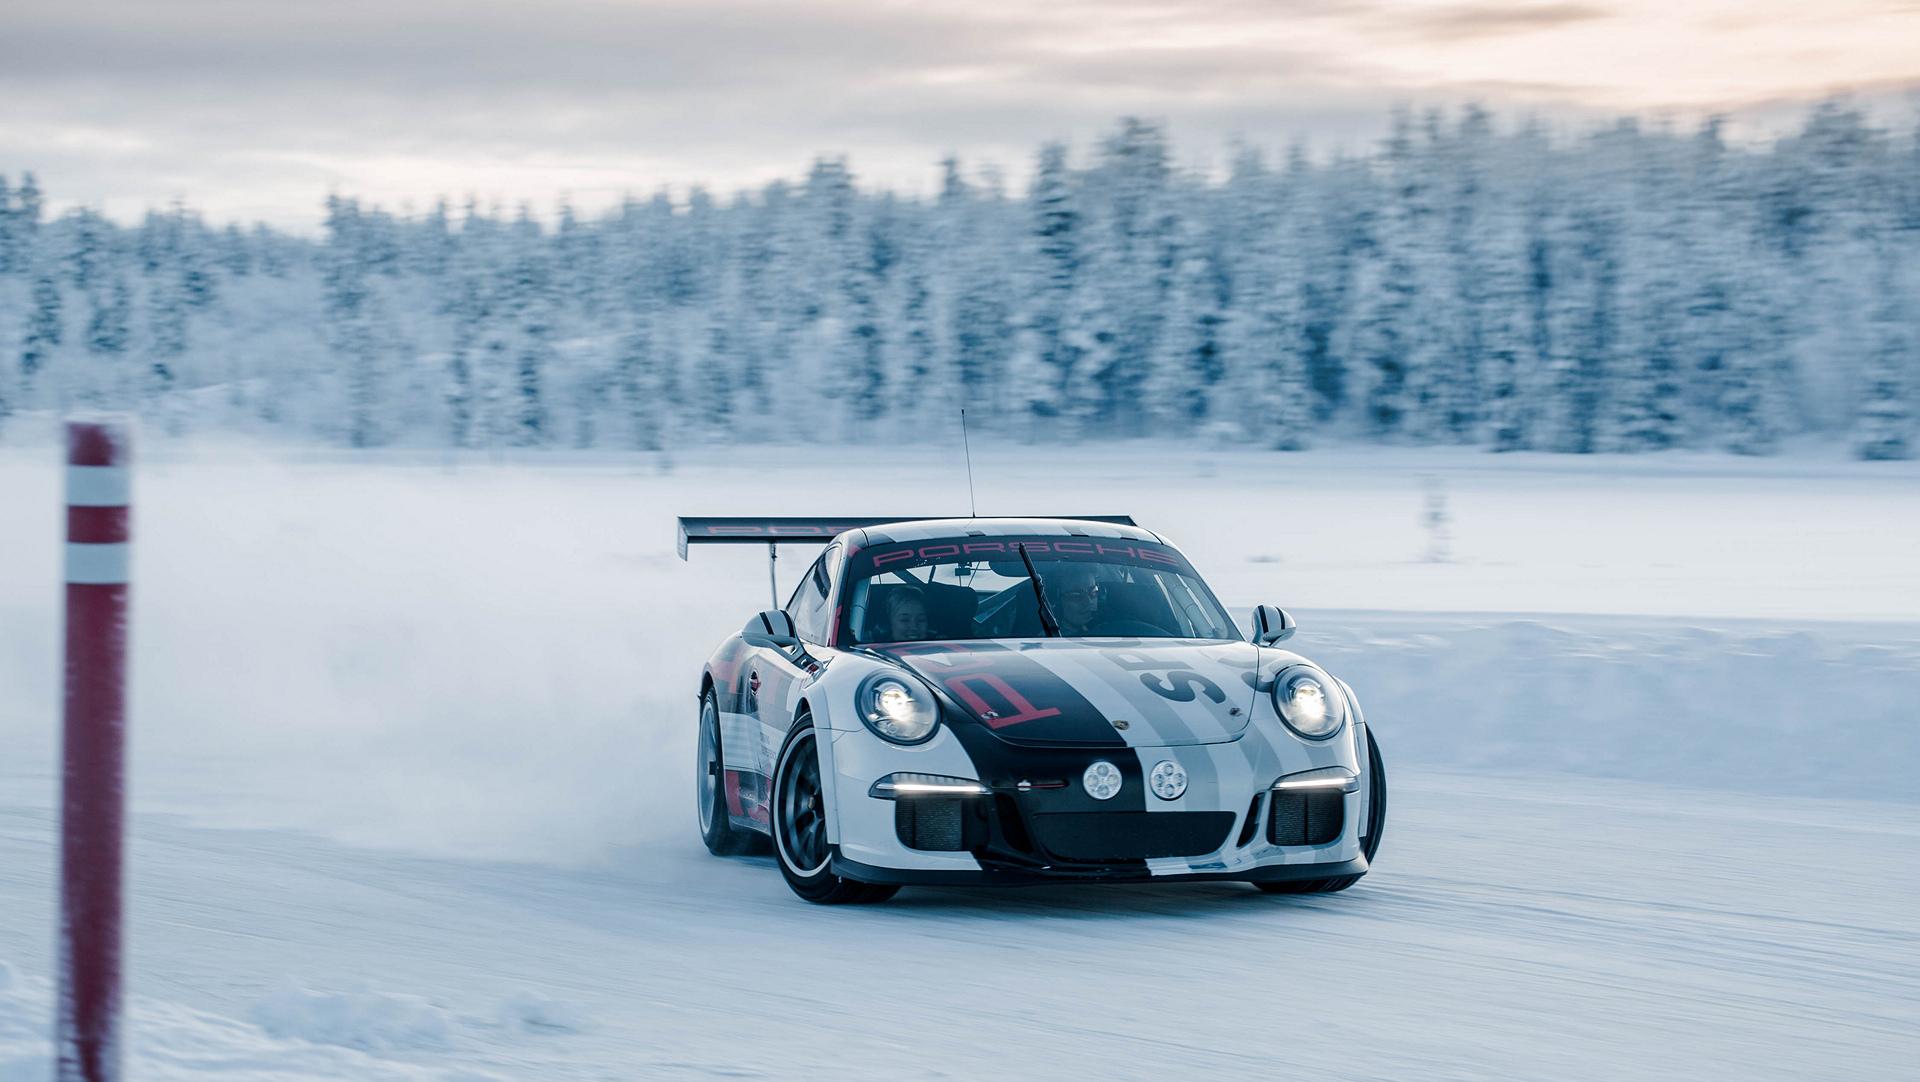 Ice Cold Driving Pleasure With Porsche Carrrs Auto Portal